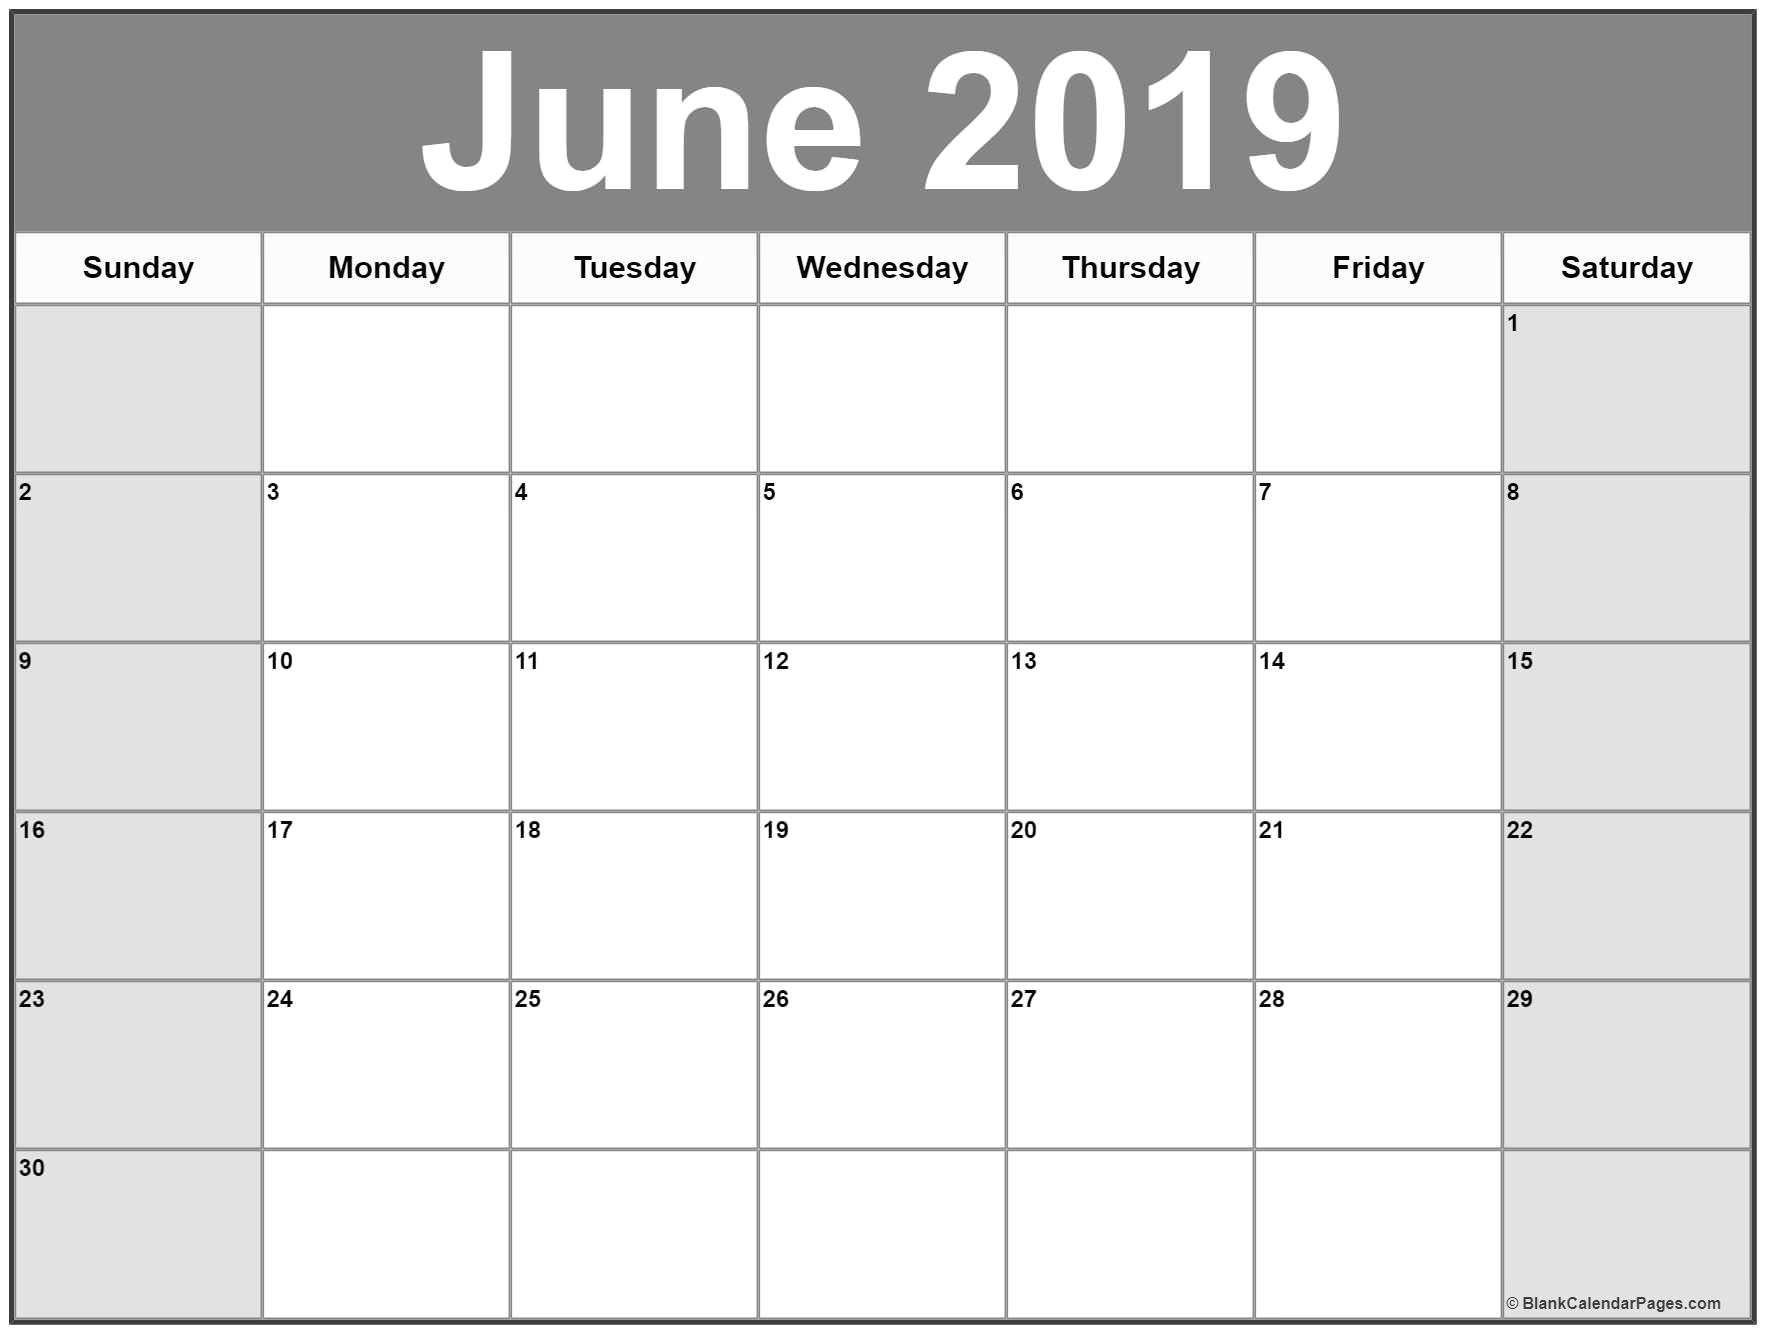 June 2019 Blank Calendar Template Free Printable Calendar